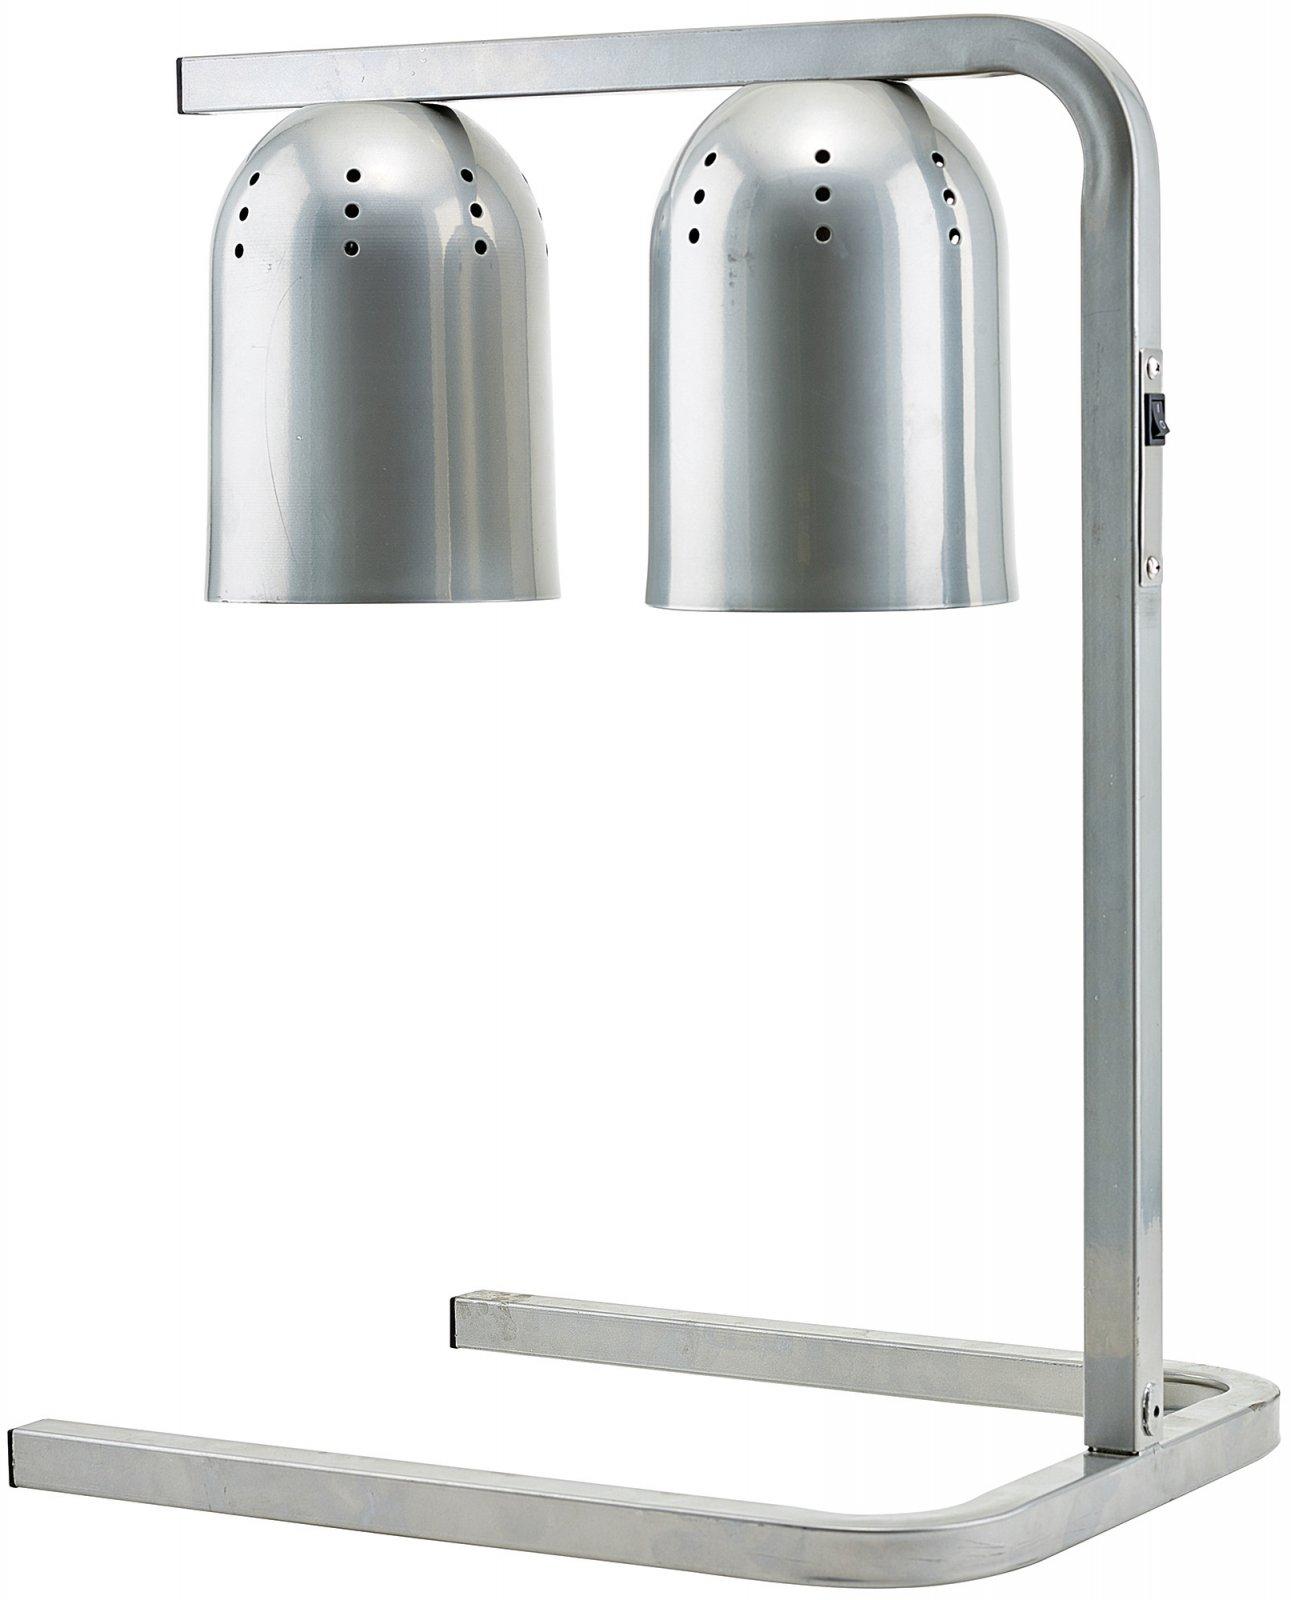 Electric Heat Lamp, Steel Base, Aluminum Light Hood, Two 250 W Bulbs, 120 V